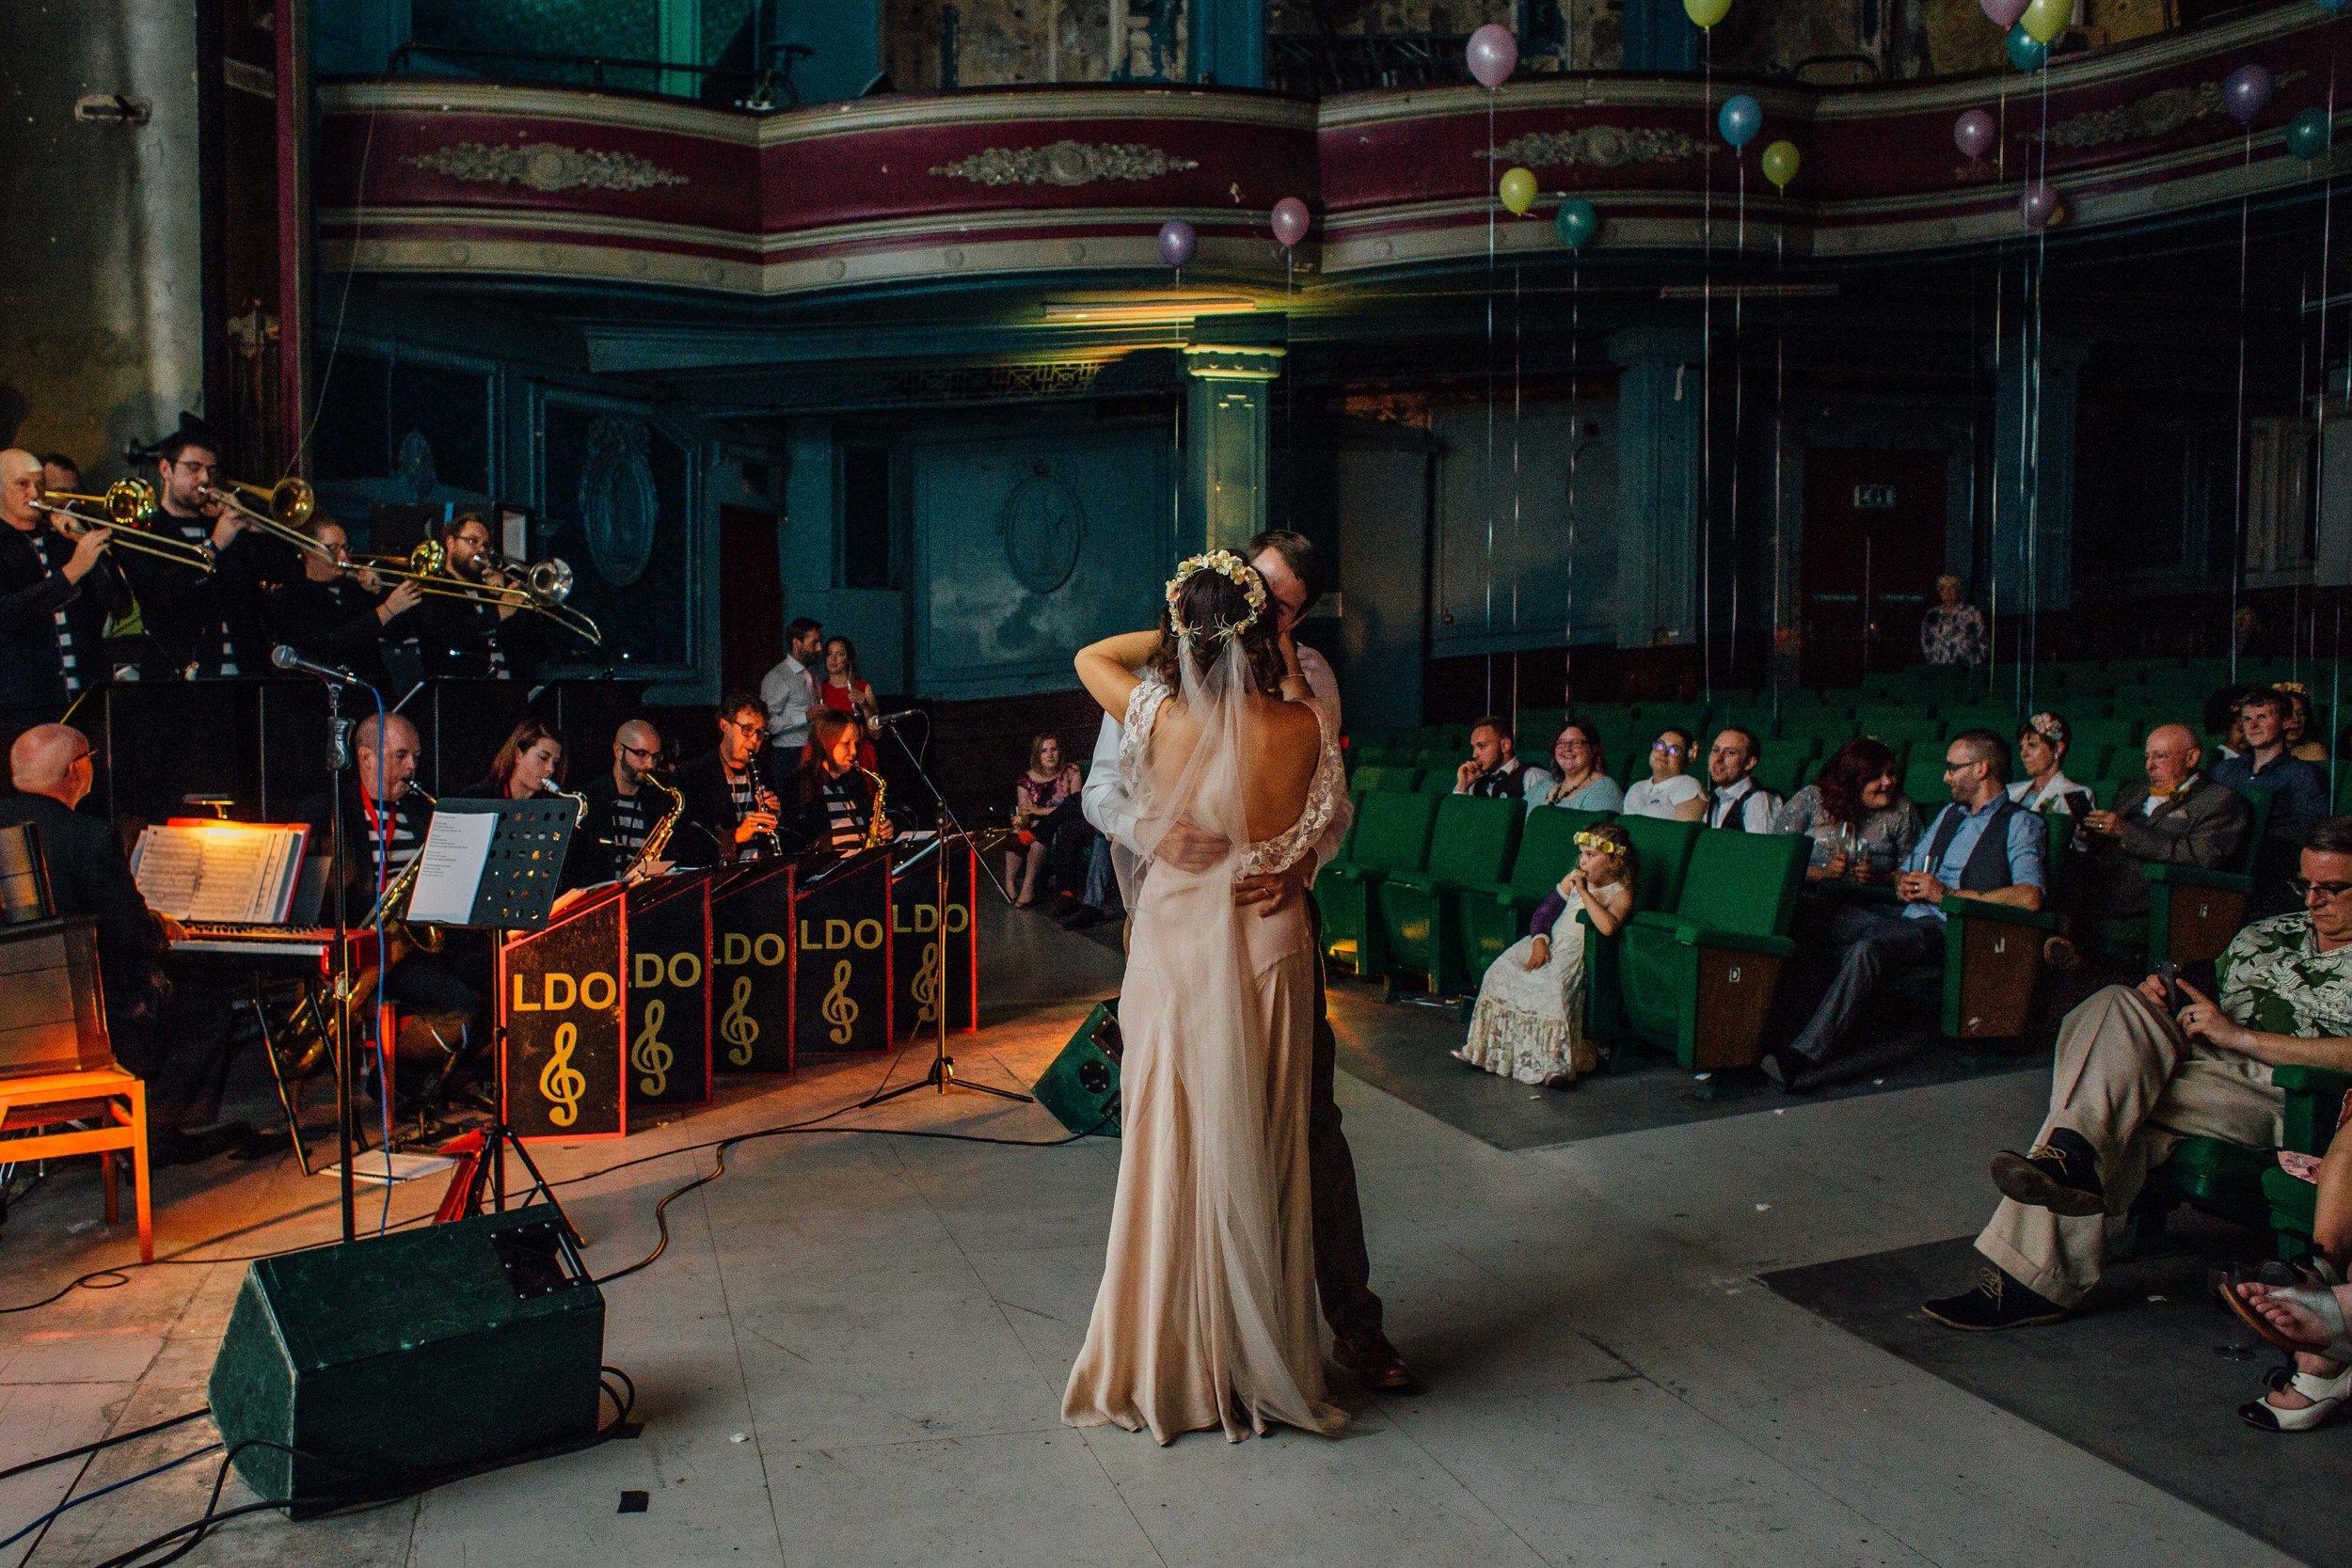 Katy-Bespoke-Veil-Sheffield-Wedding-Wes-Anderson-Susanna-Greening-Derbyshire-30